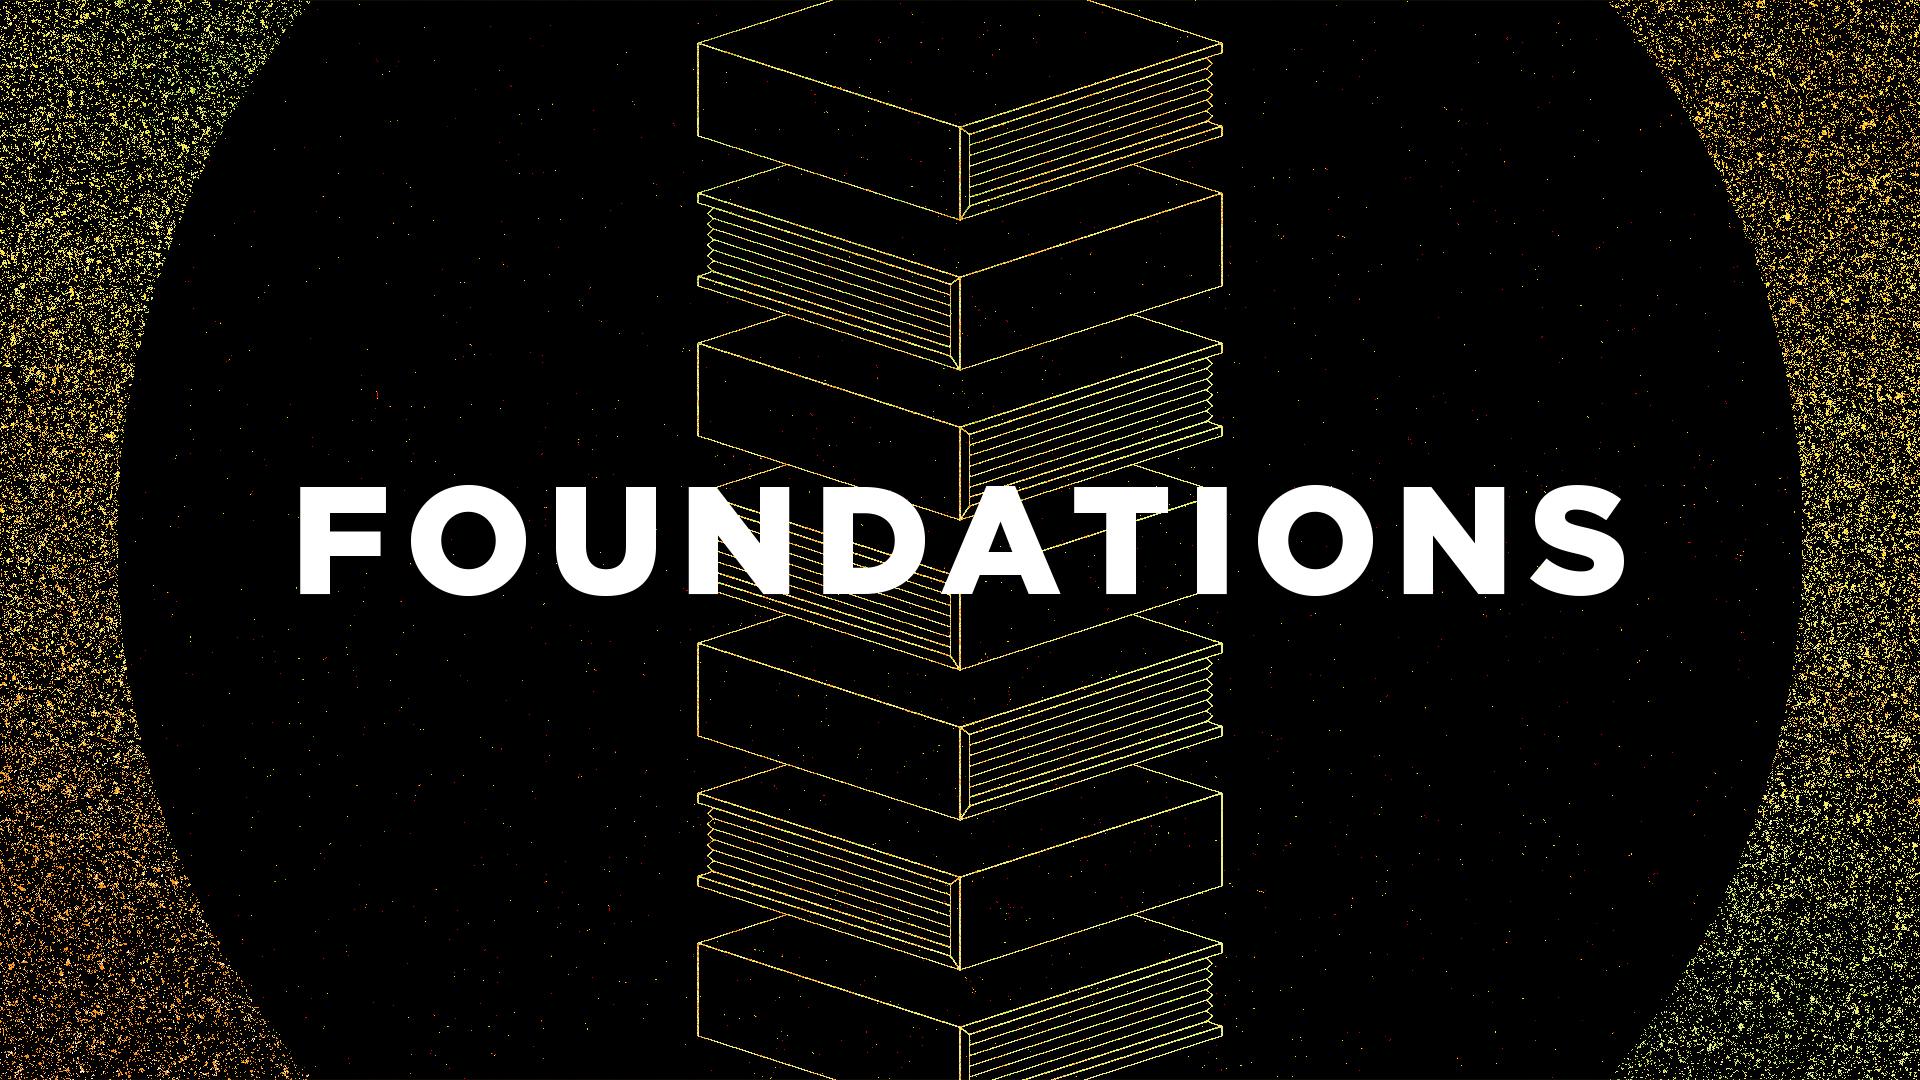 180 Foundations Series Graphic.jpg